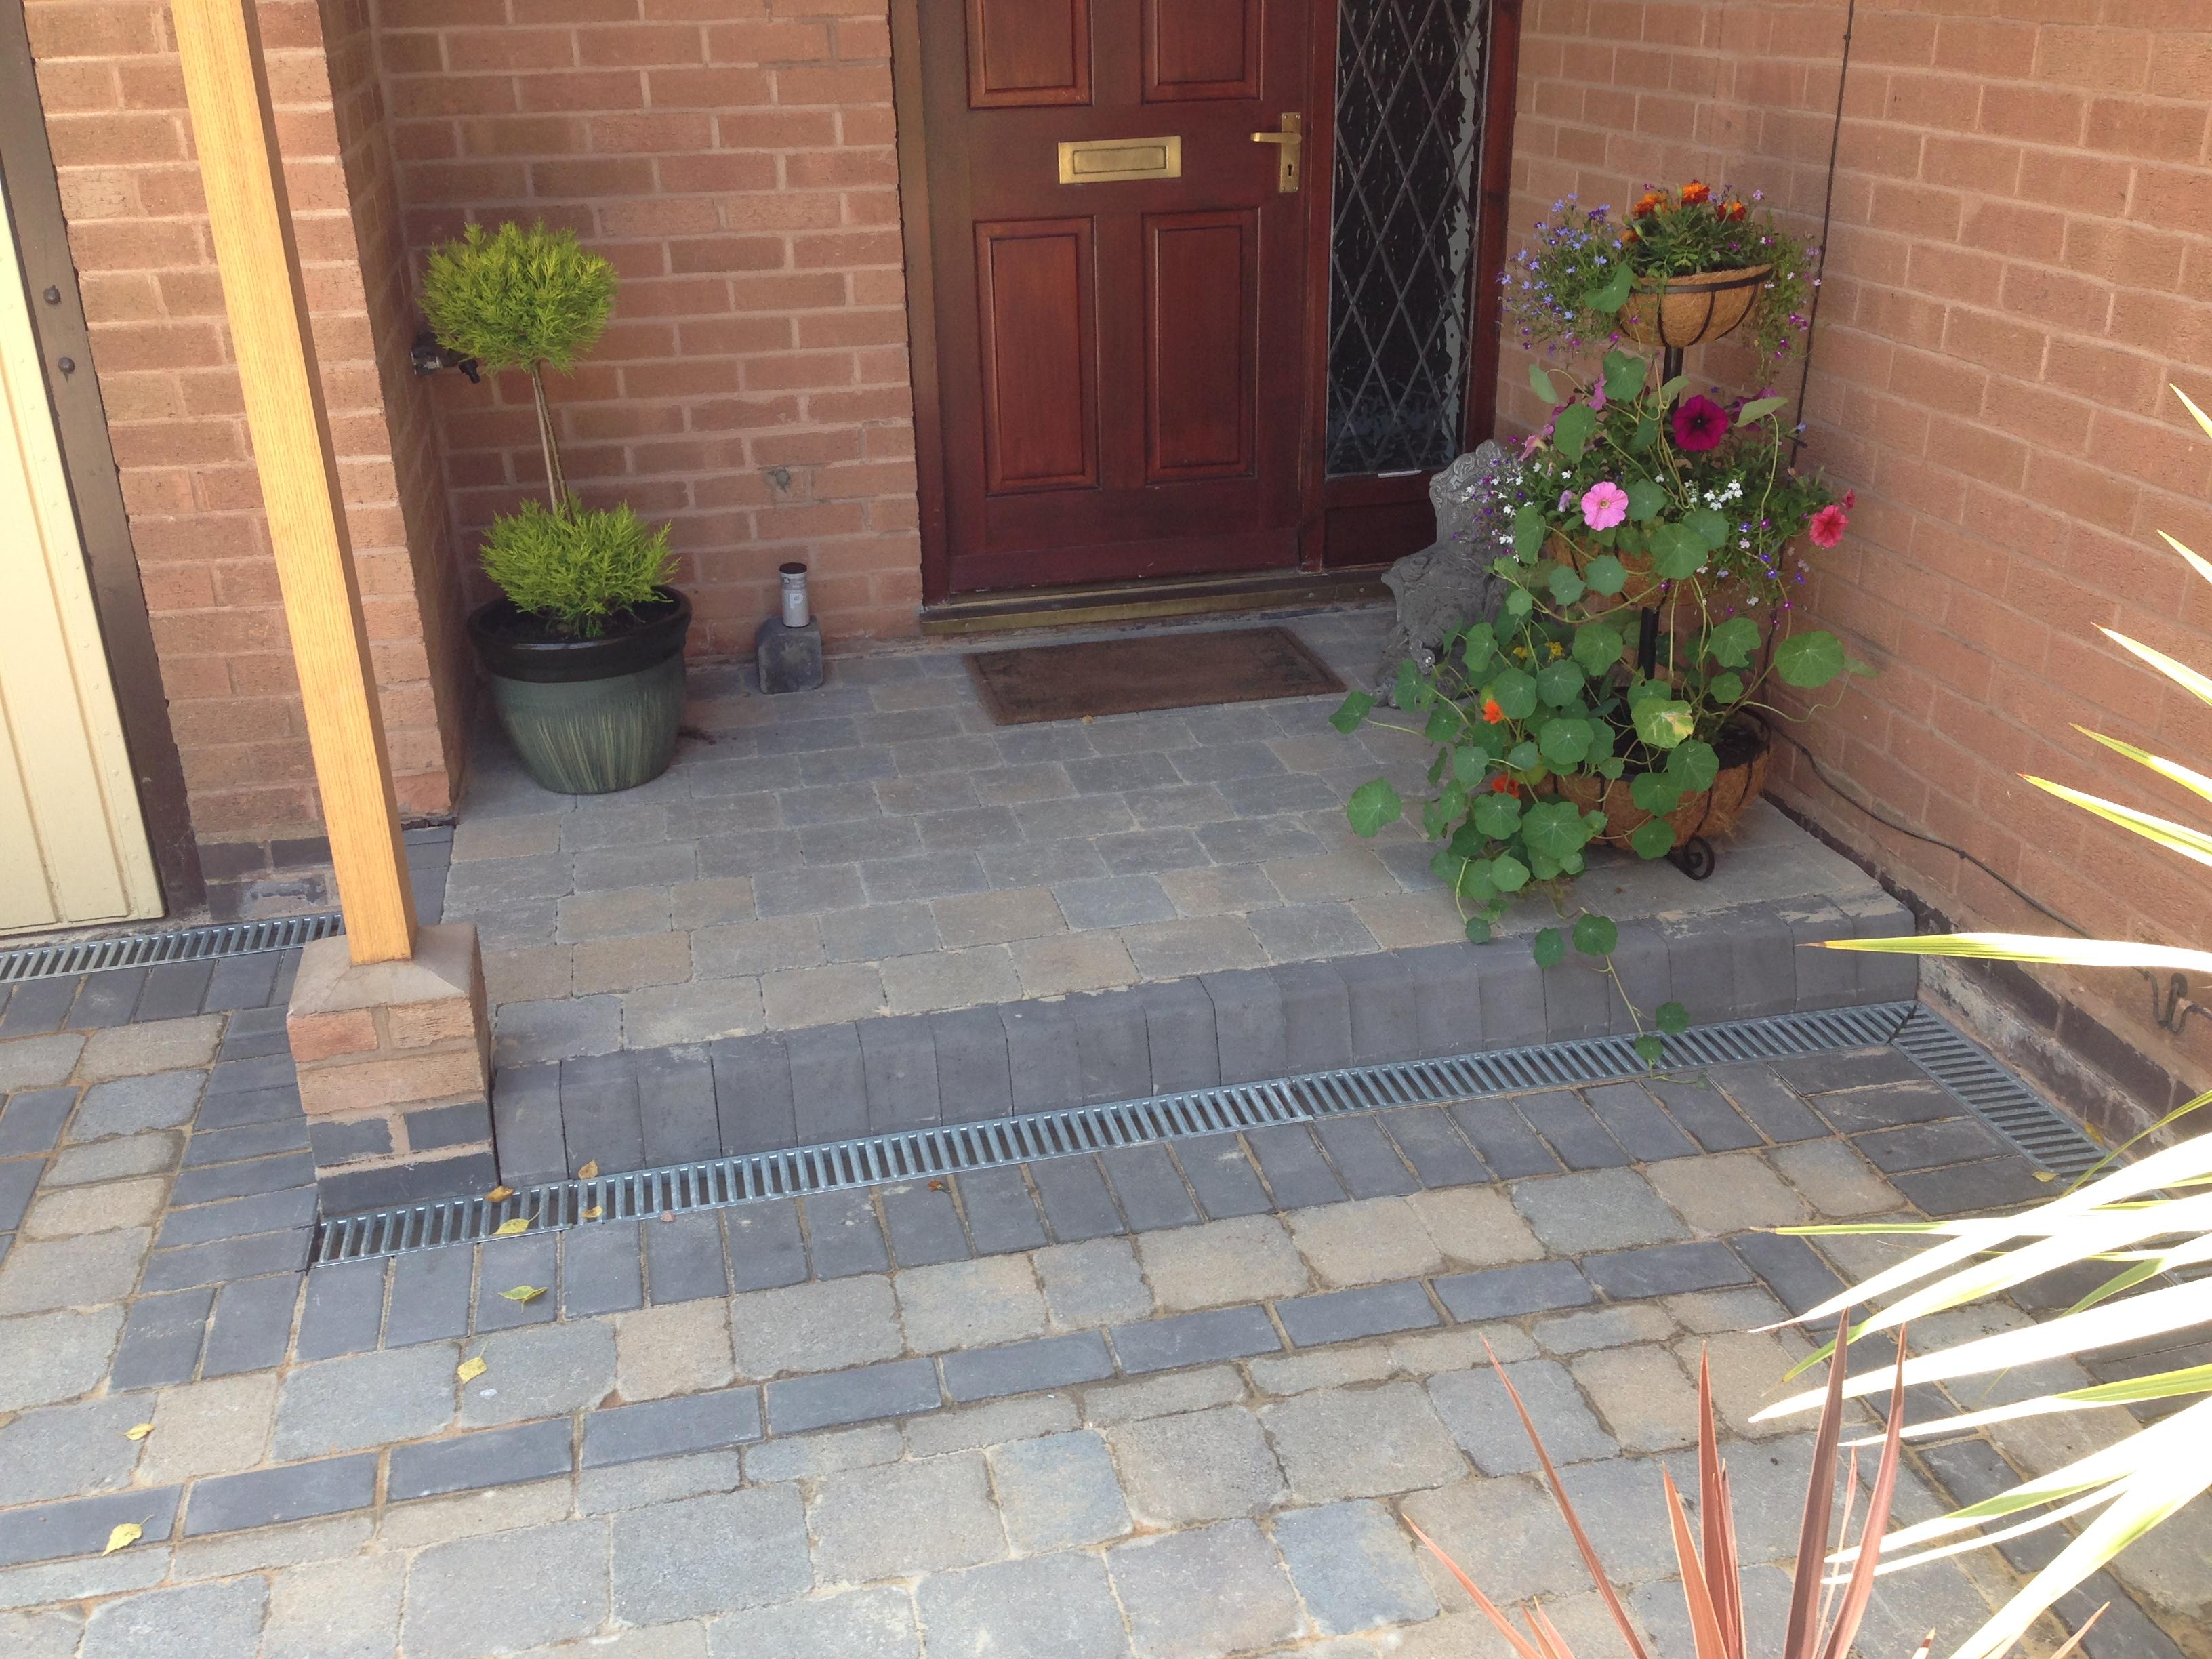 Drainage & Steps